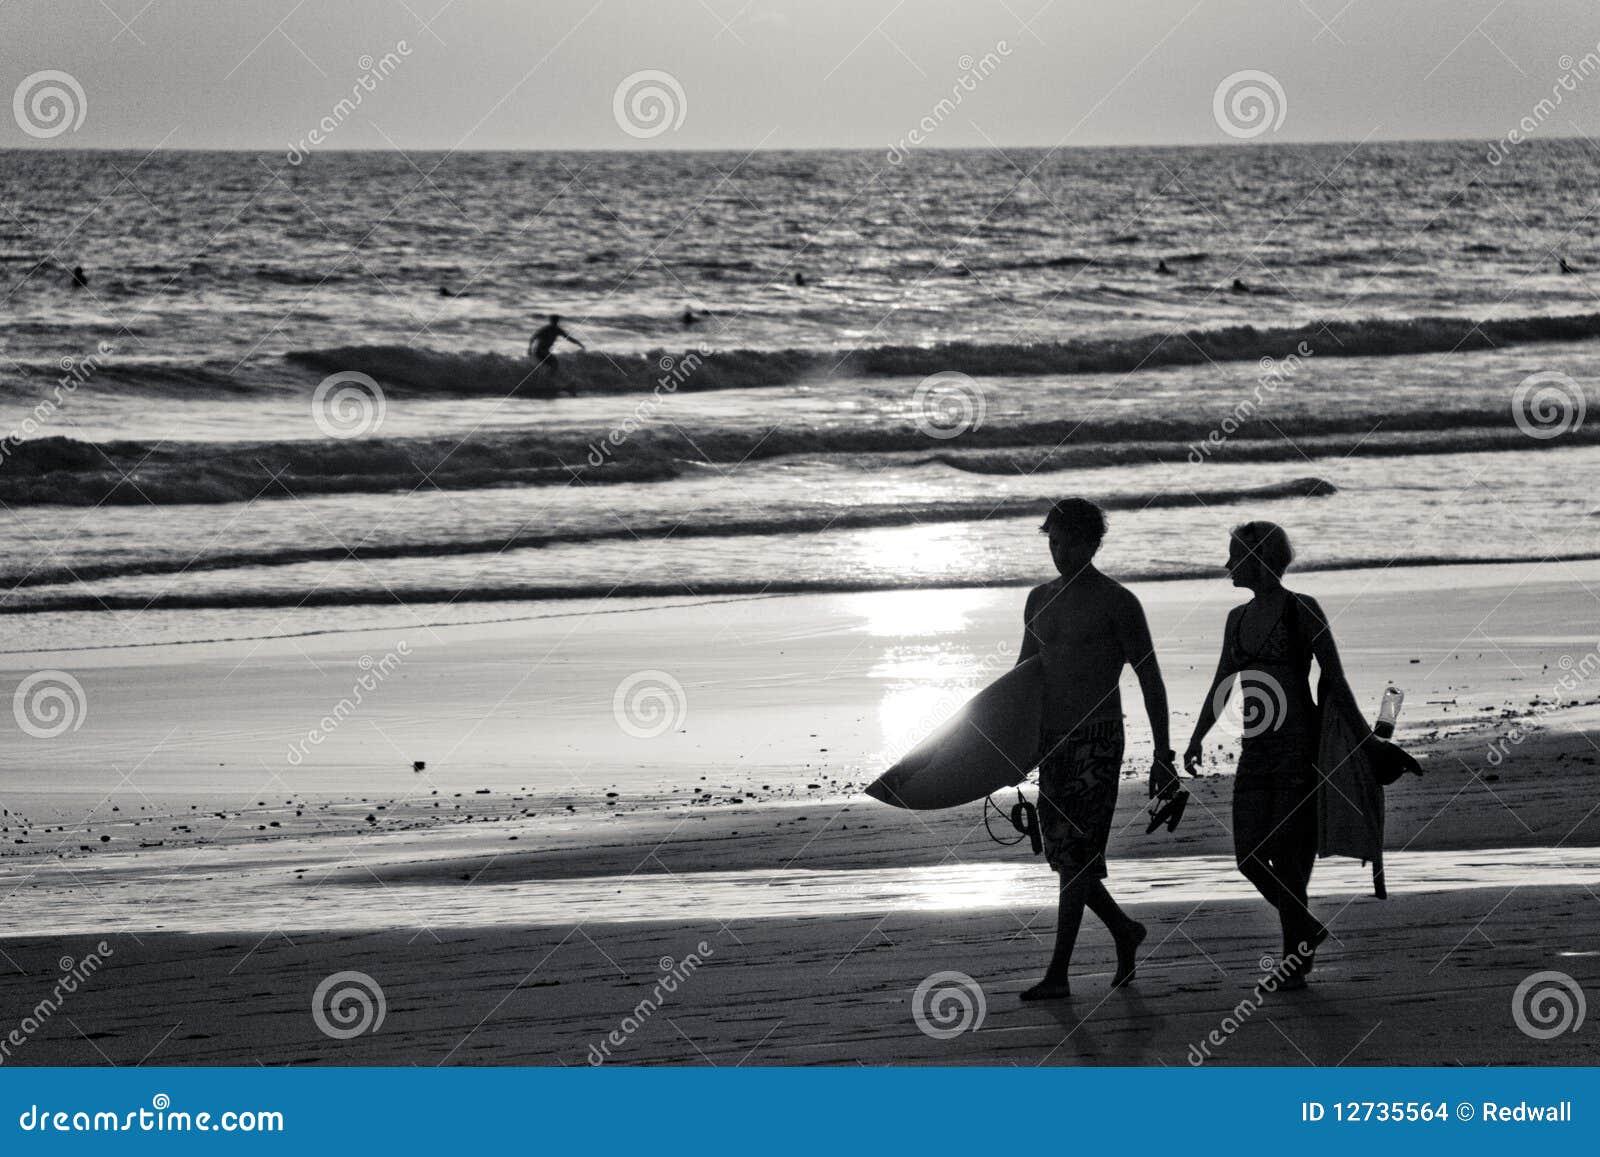 how to take nice beach photos